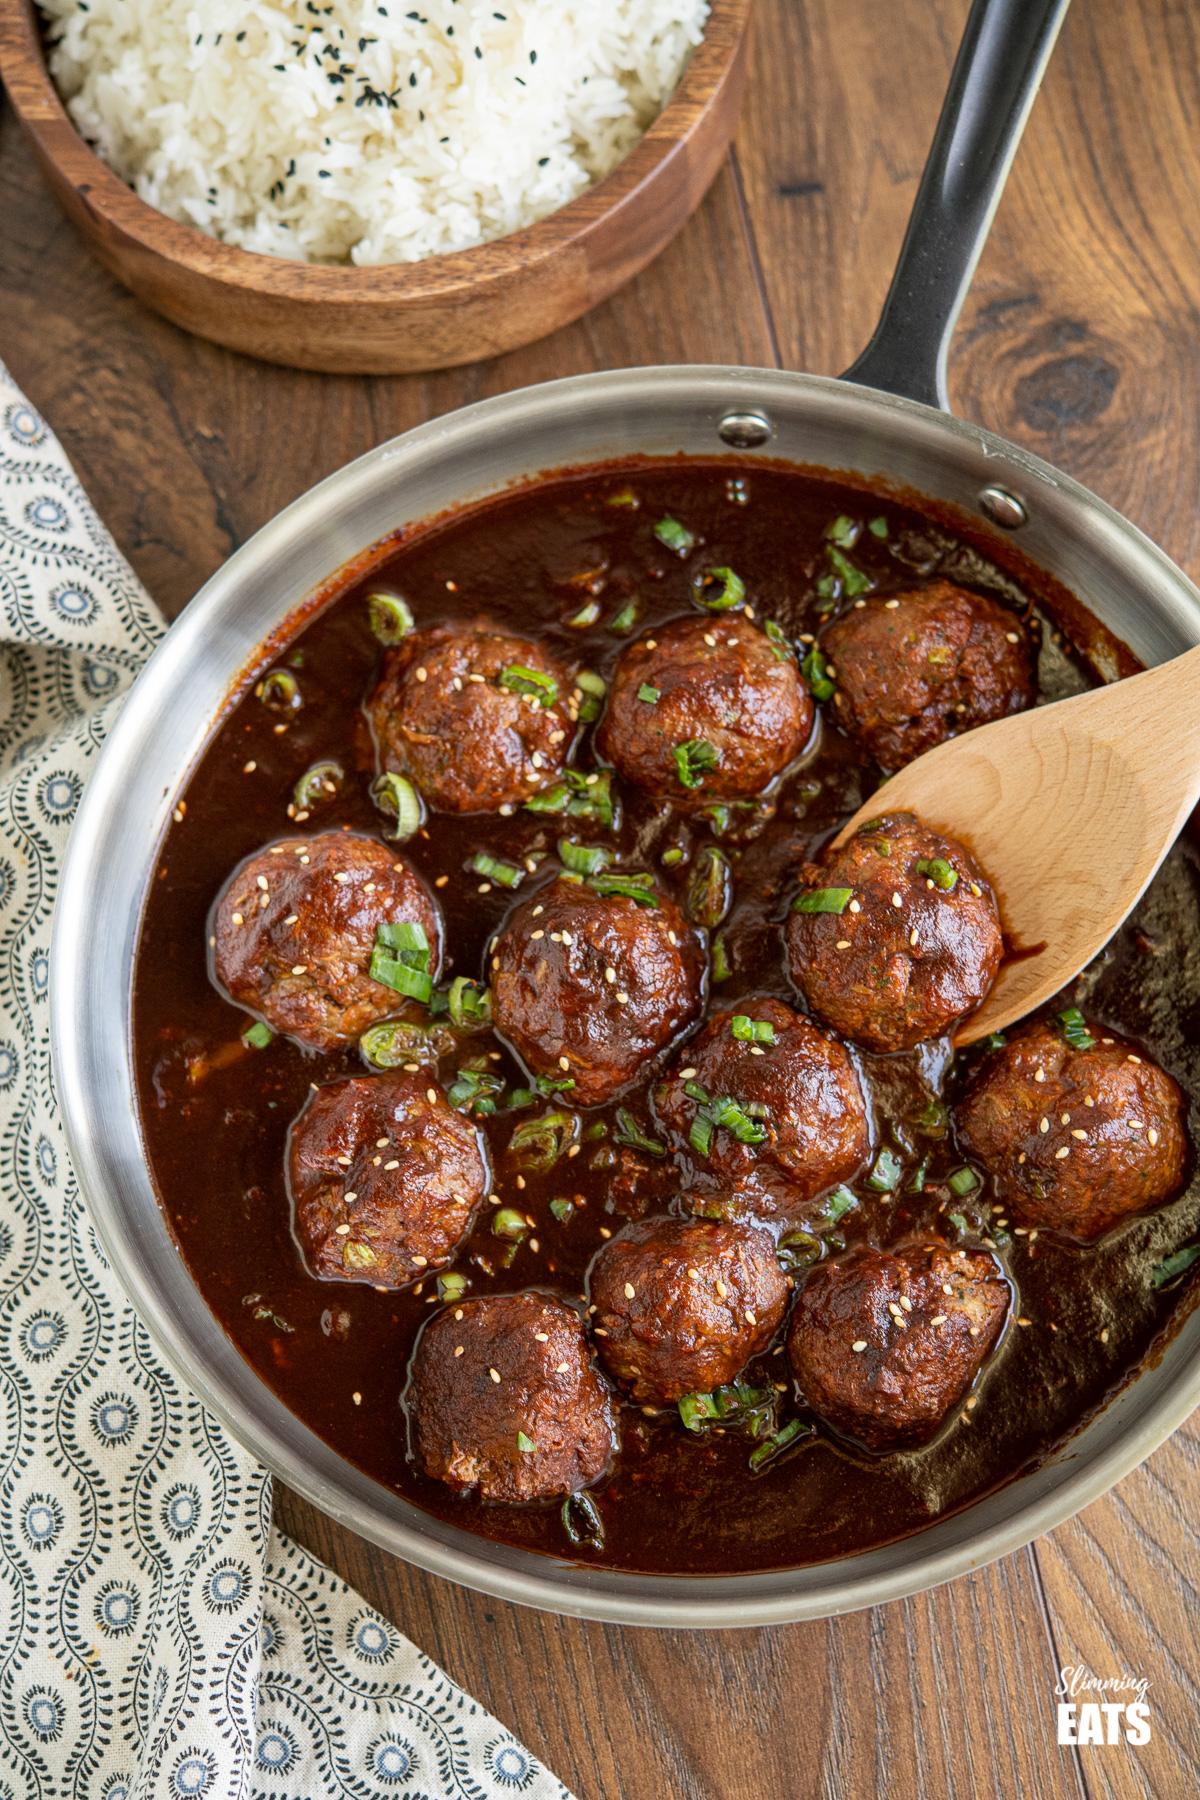 Saucy Asian Hidden Vegetable Beef Meatballs in frying pan with rice in wooden bowl